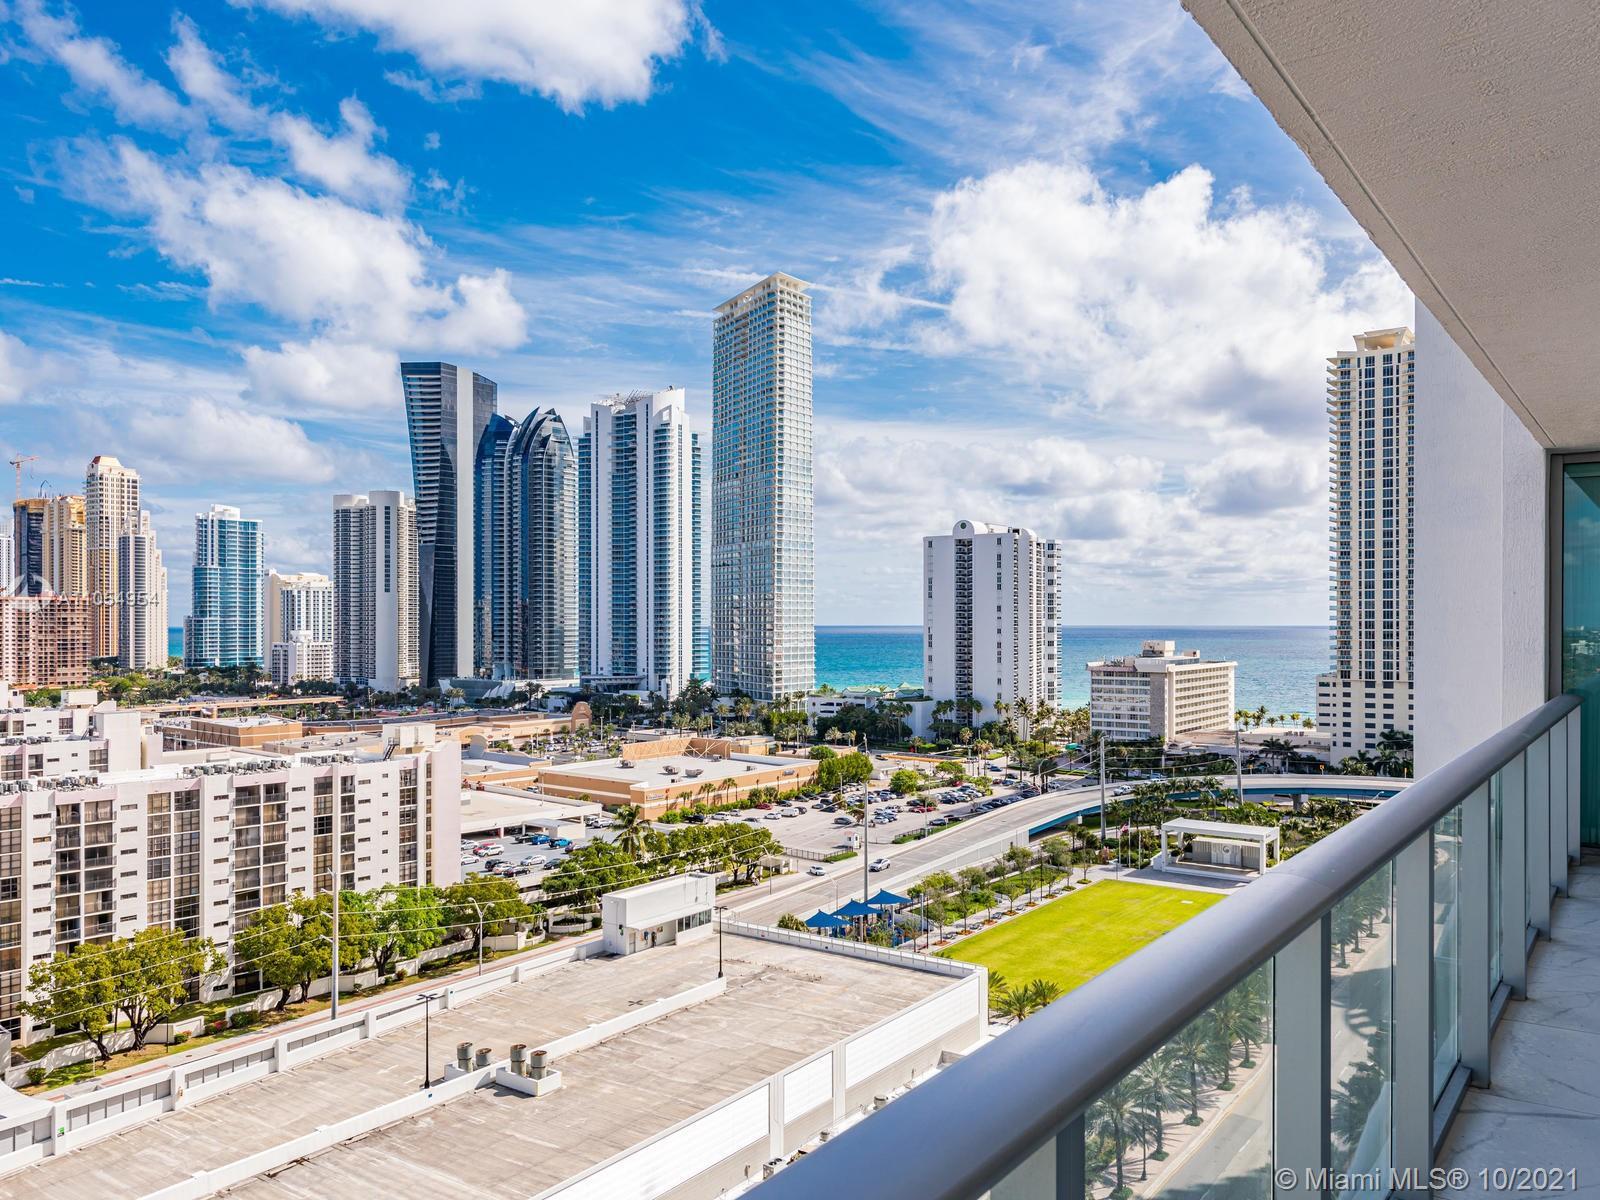 Parque Tower 1 #1607 - 300 sunny isles blvd #1607, Sunny Isles Beach, FL 33160